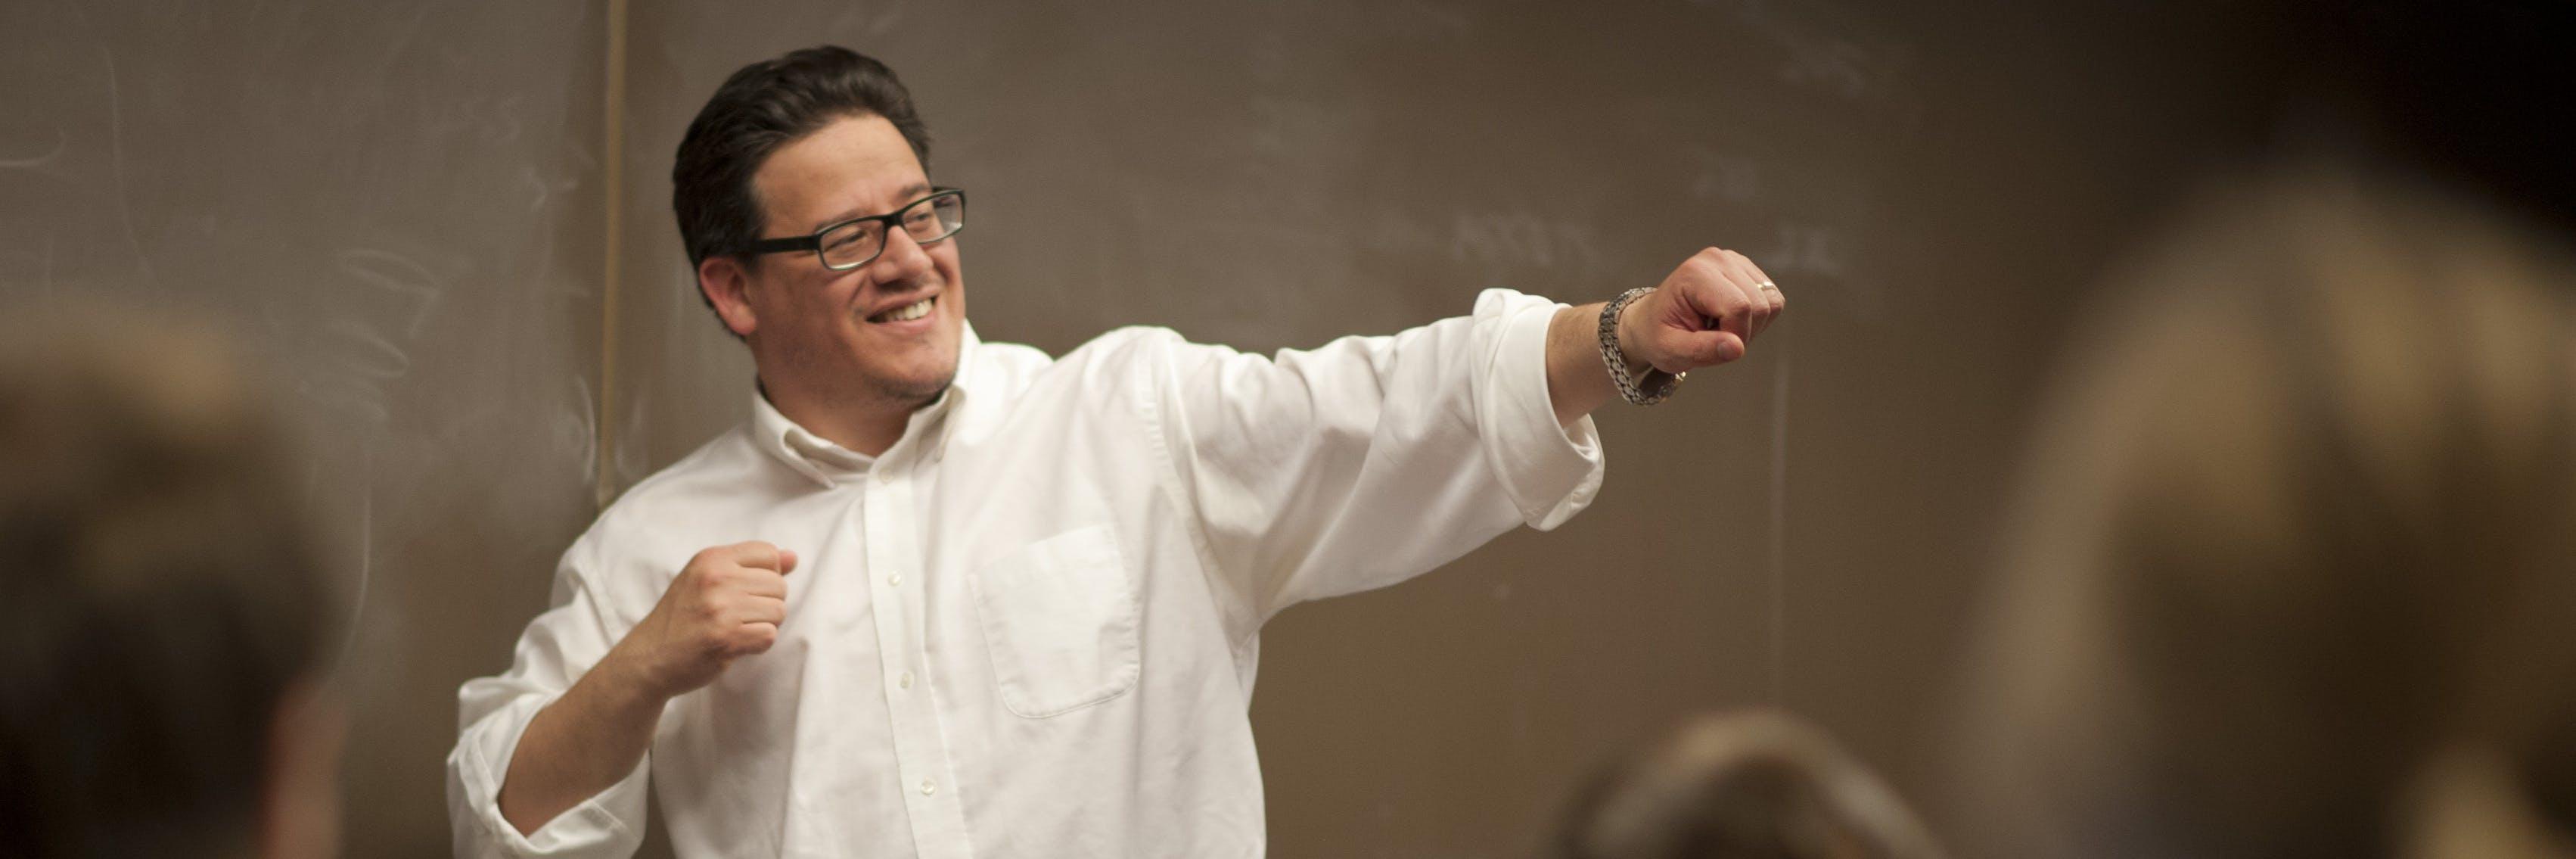 Animated professor teaching a class